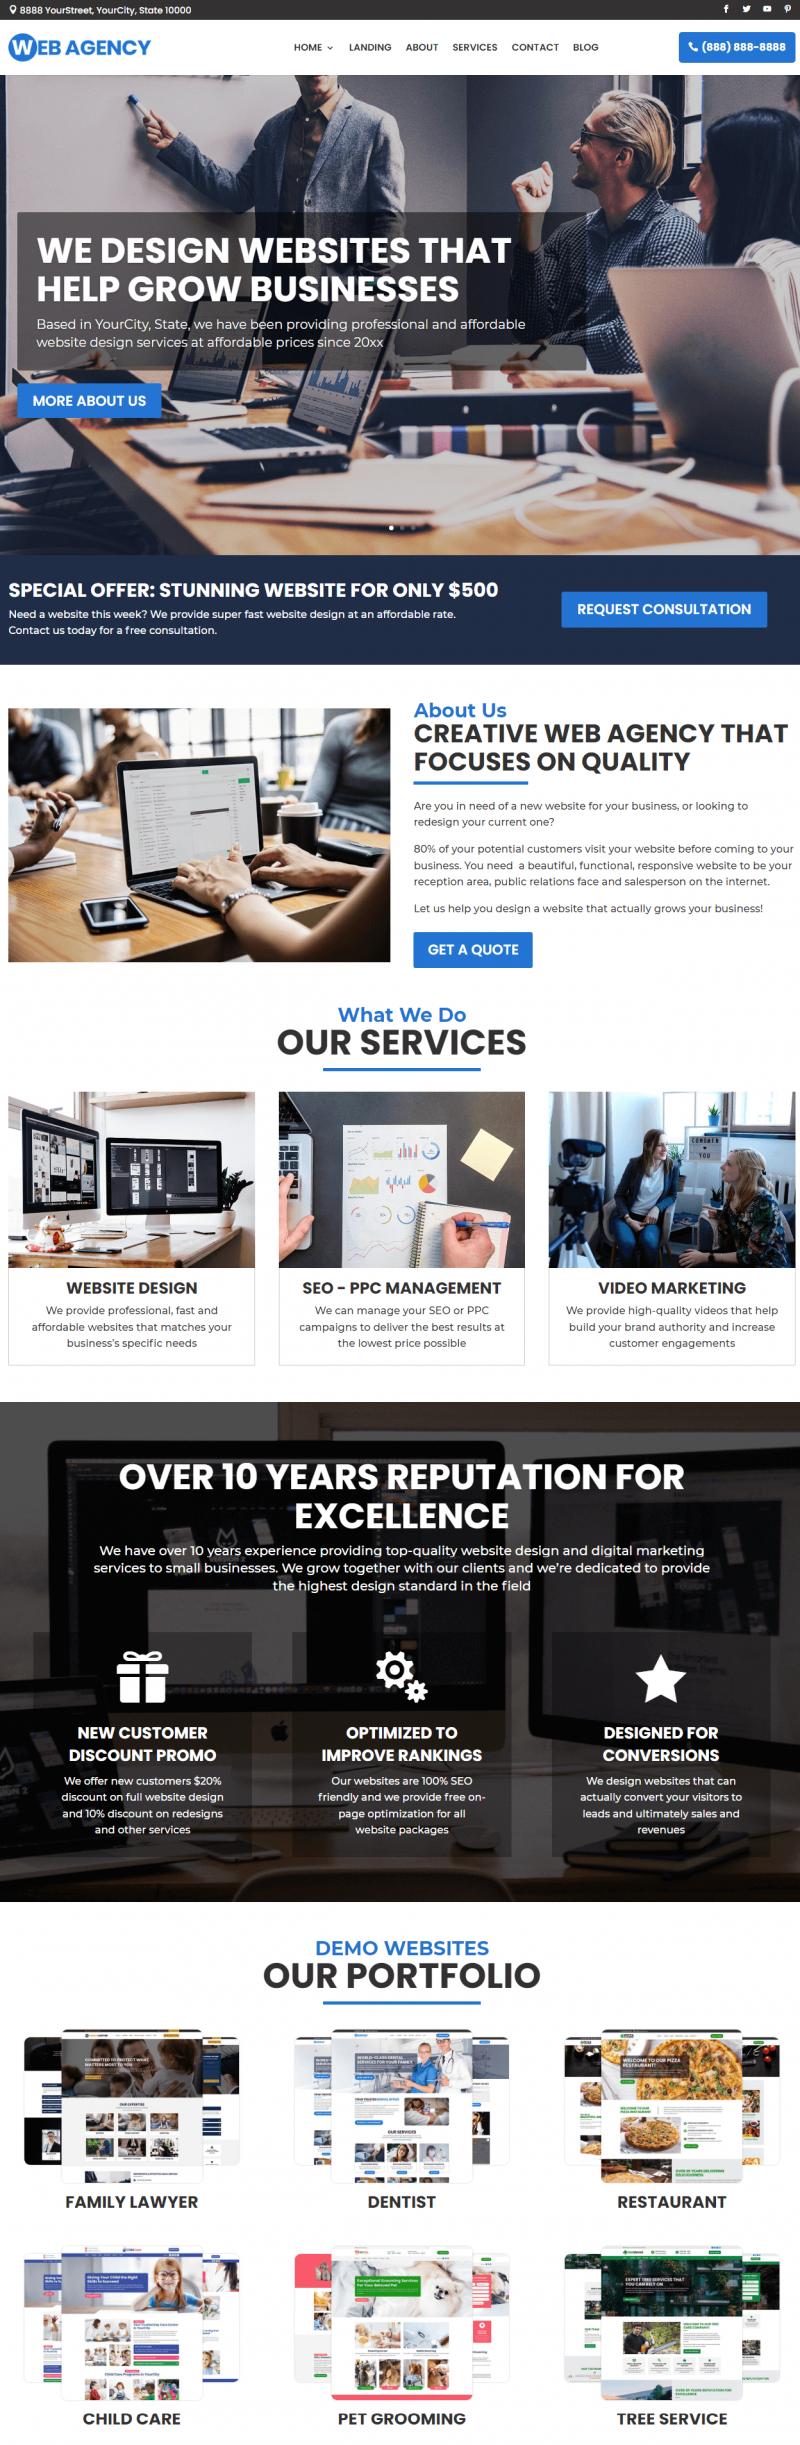 Powerful Web Design Agency Website